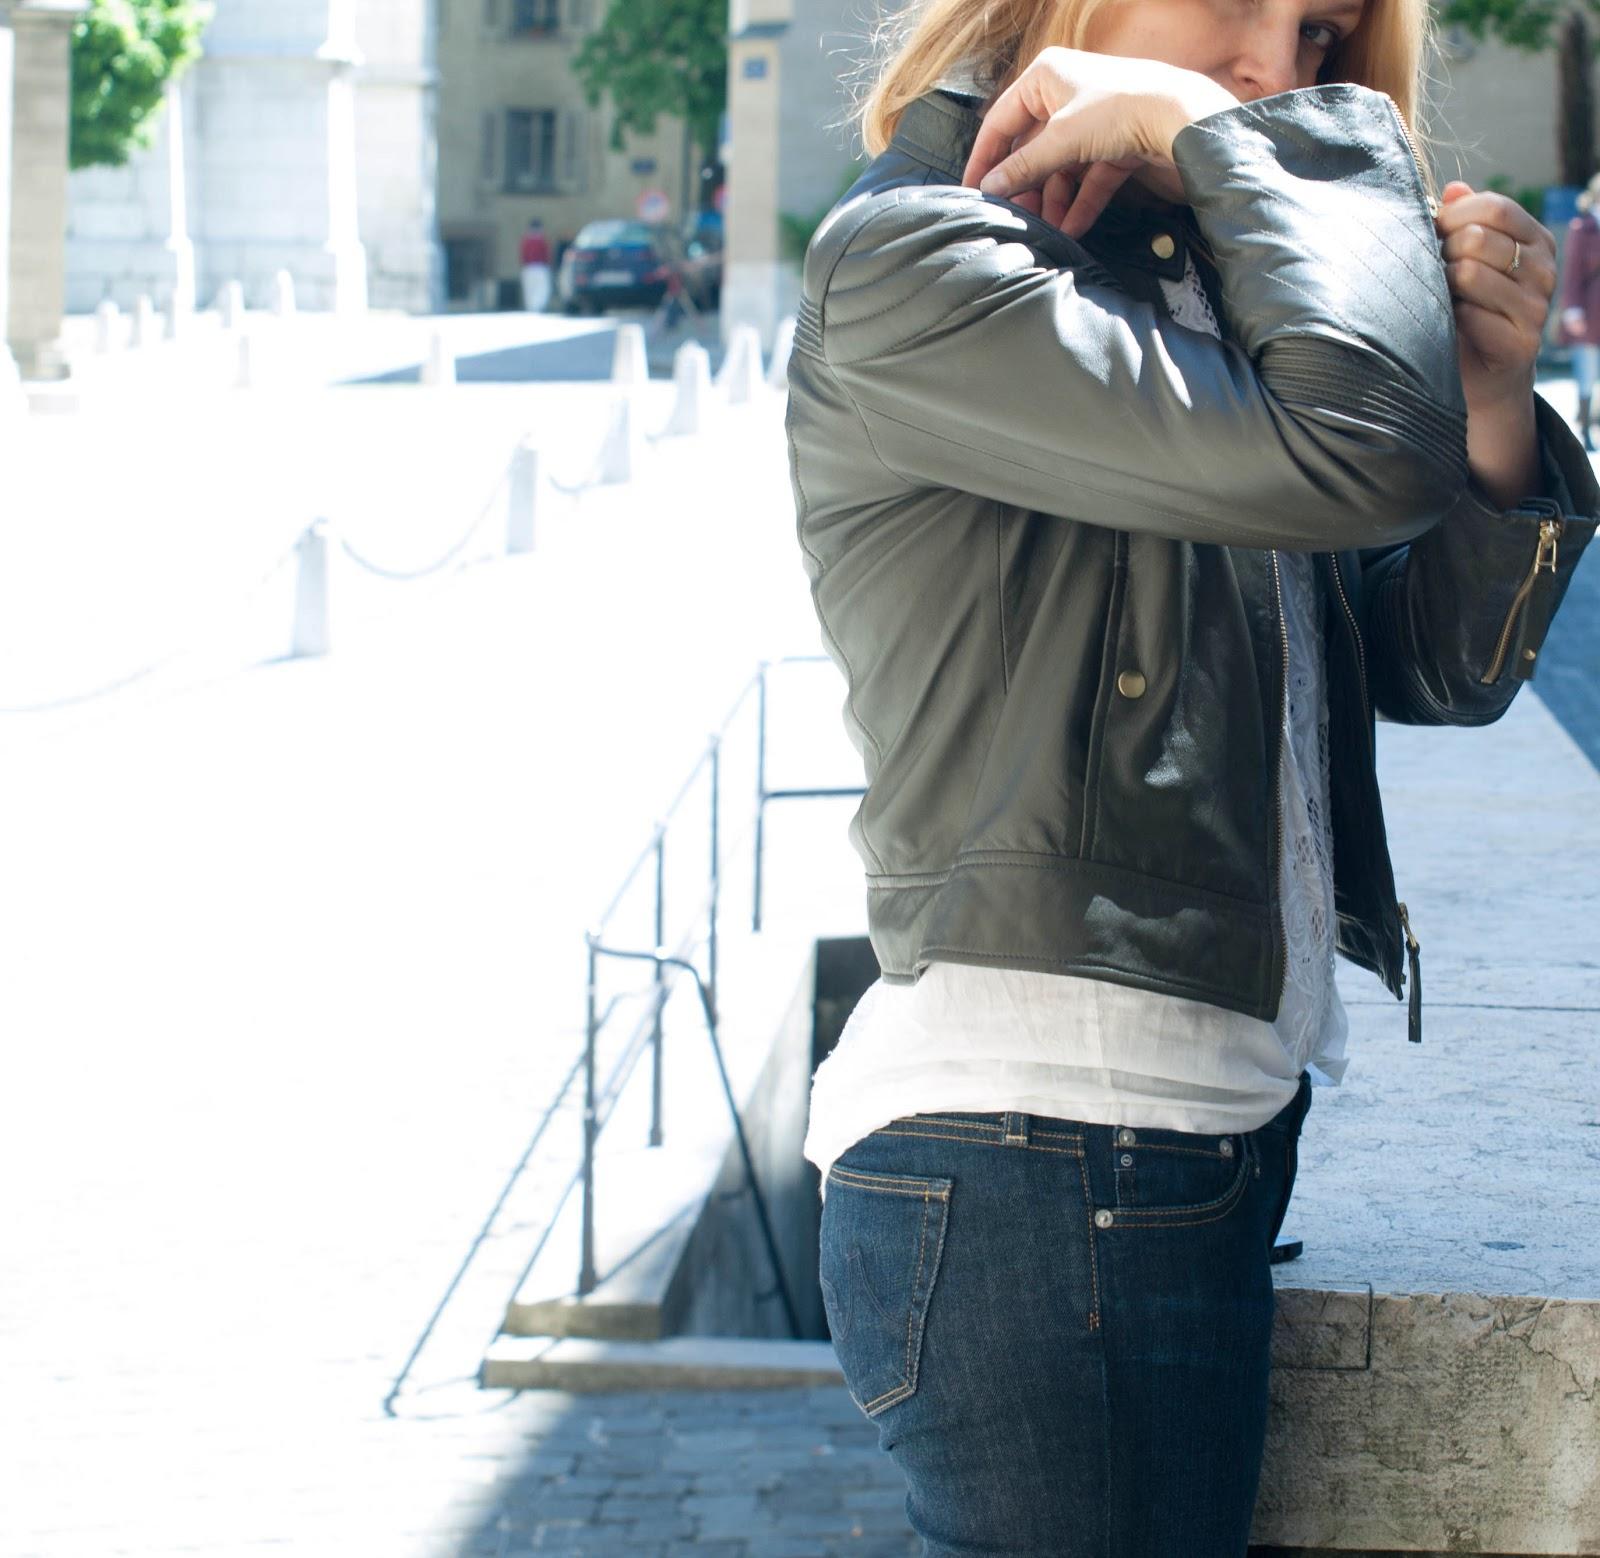 Biker, Max&Co, lace up heels, BIker jacket, Biker jacket in color, sergio Rossi heels, Maxandco jacket, AG jeans the stilt